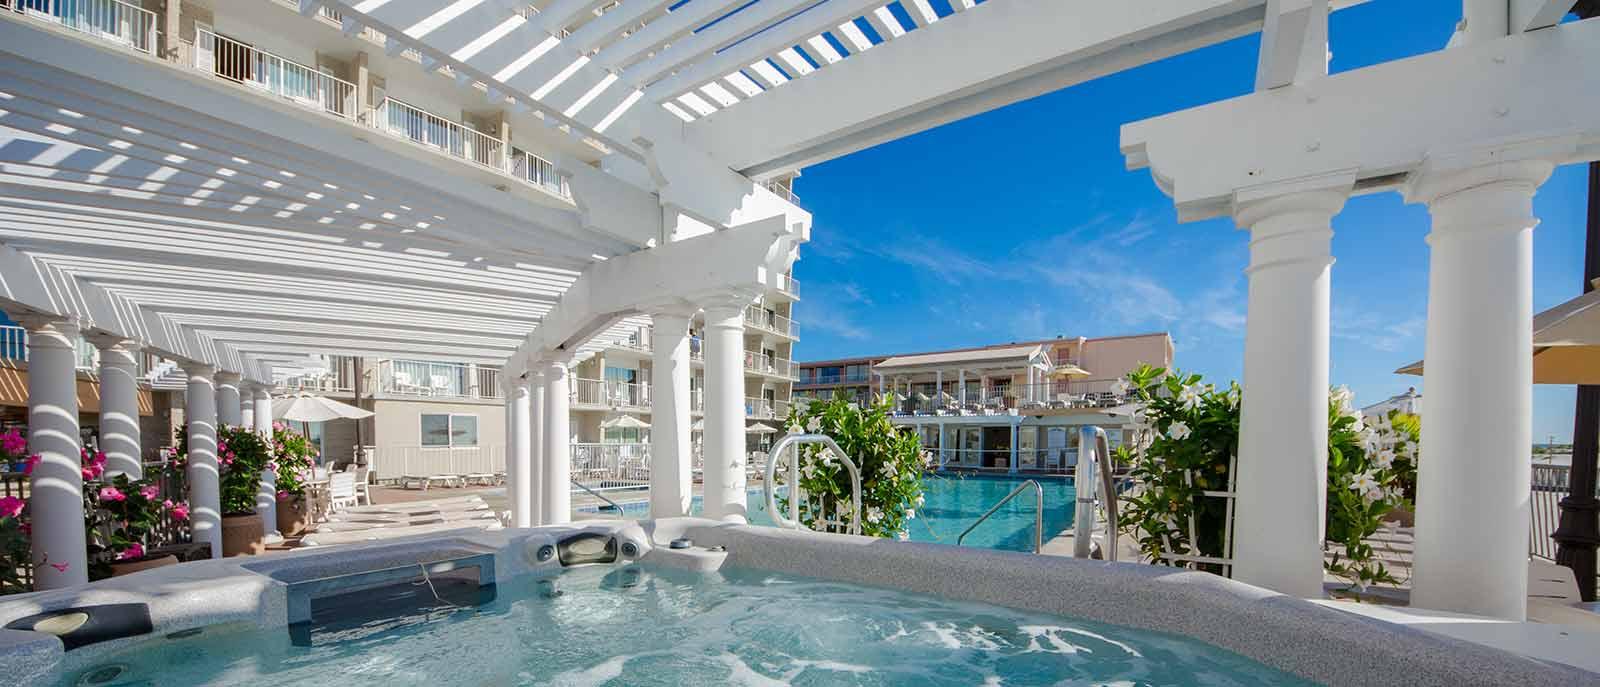 Wildwood Crest Hotel Pool